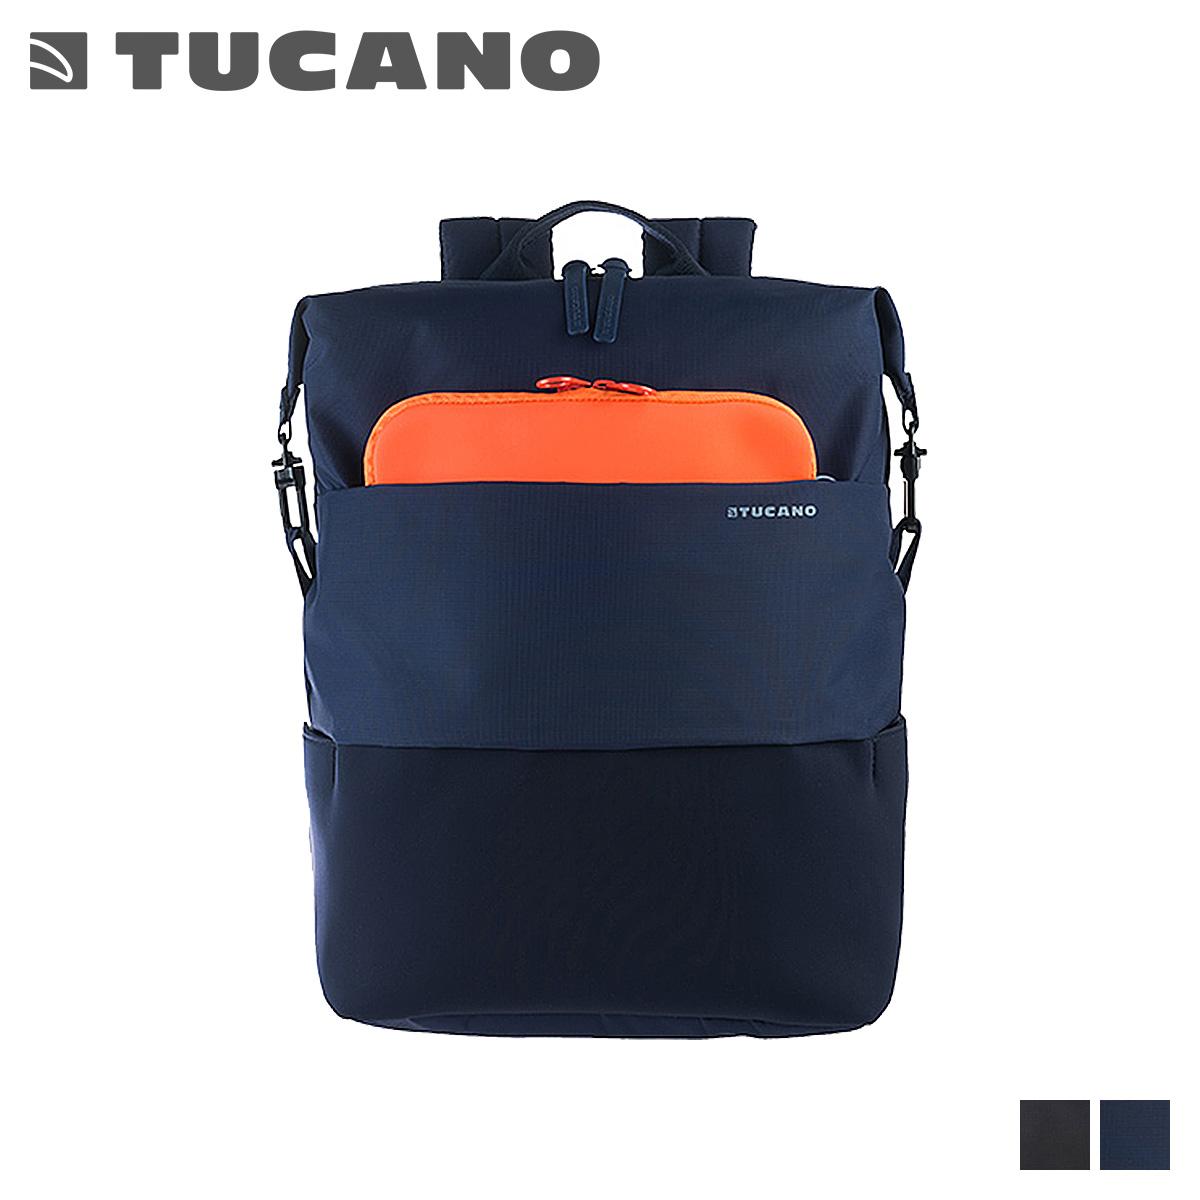 TUCANO MODO ツカーノ リュック バッグ バックパック メンズ レディース ブラック ブルー 黒 BMDOKS